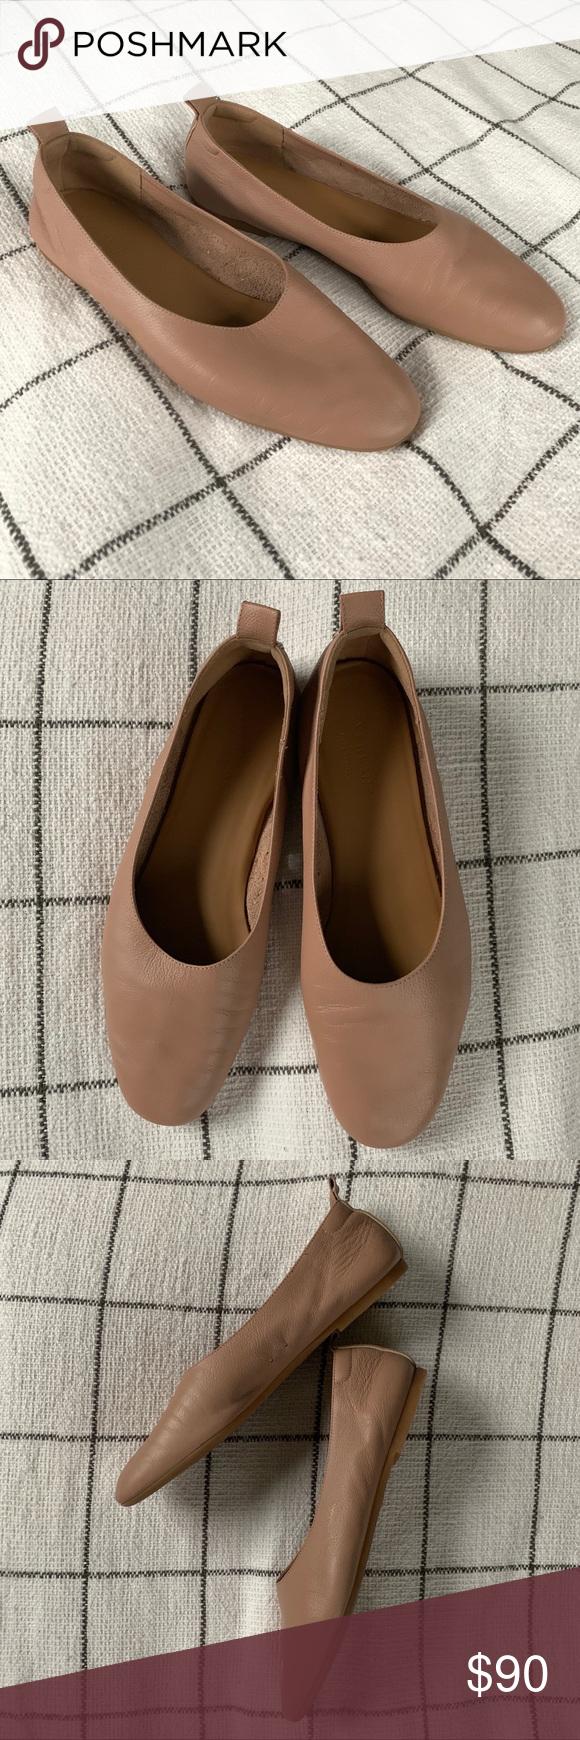 Everlane shoes, Flats